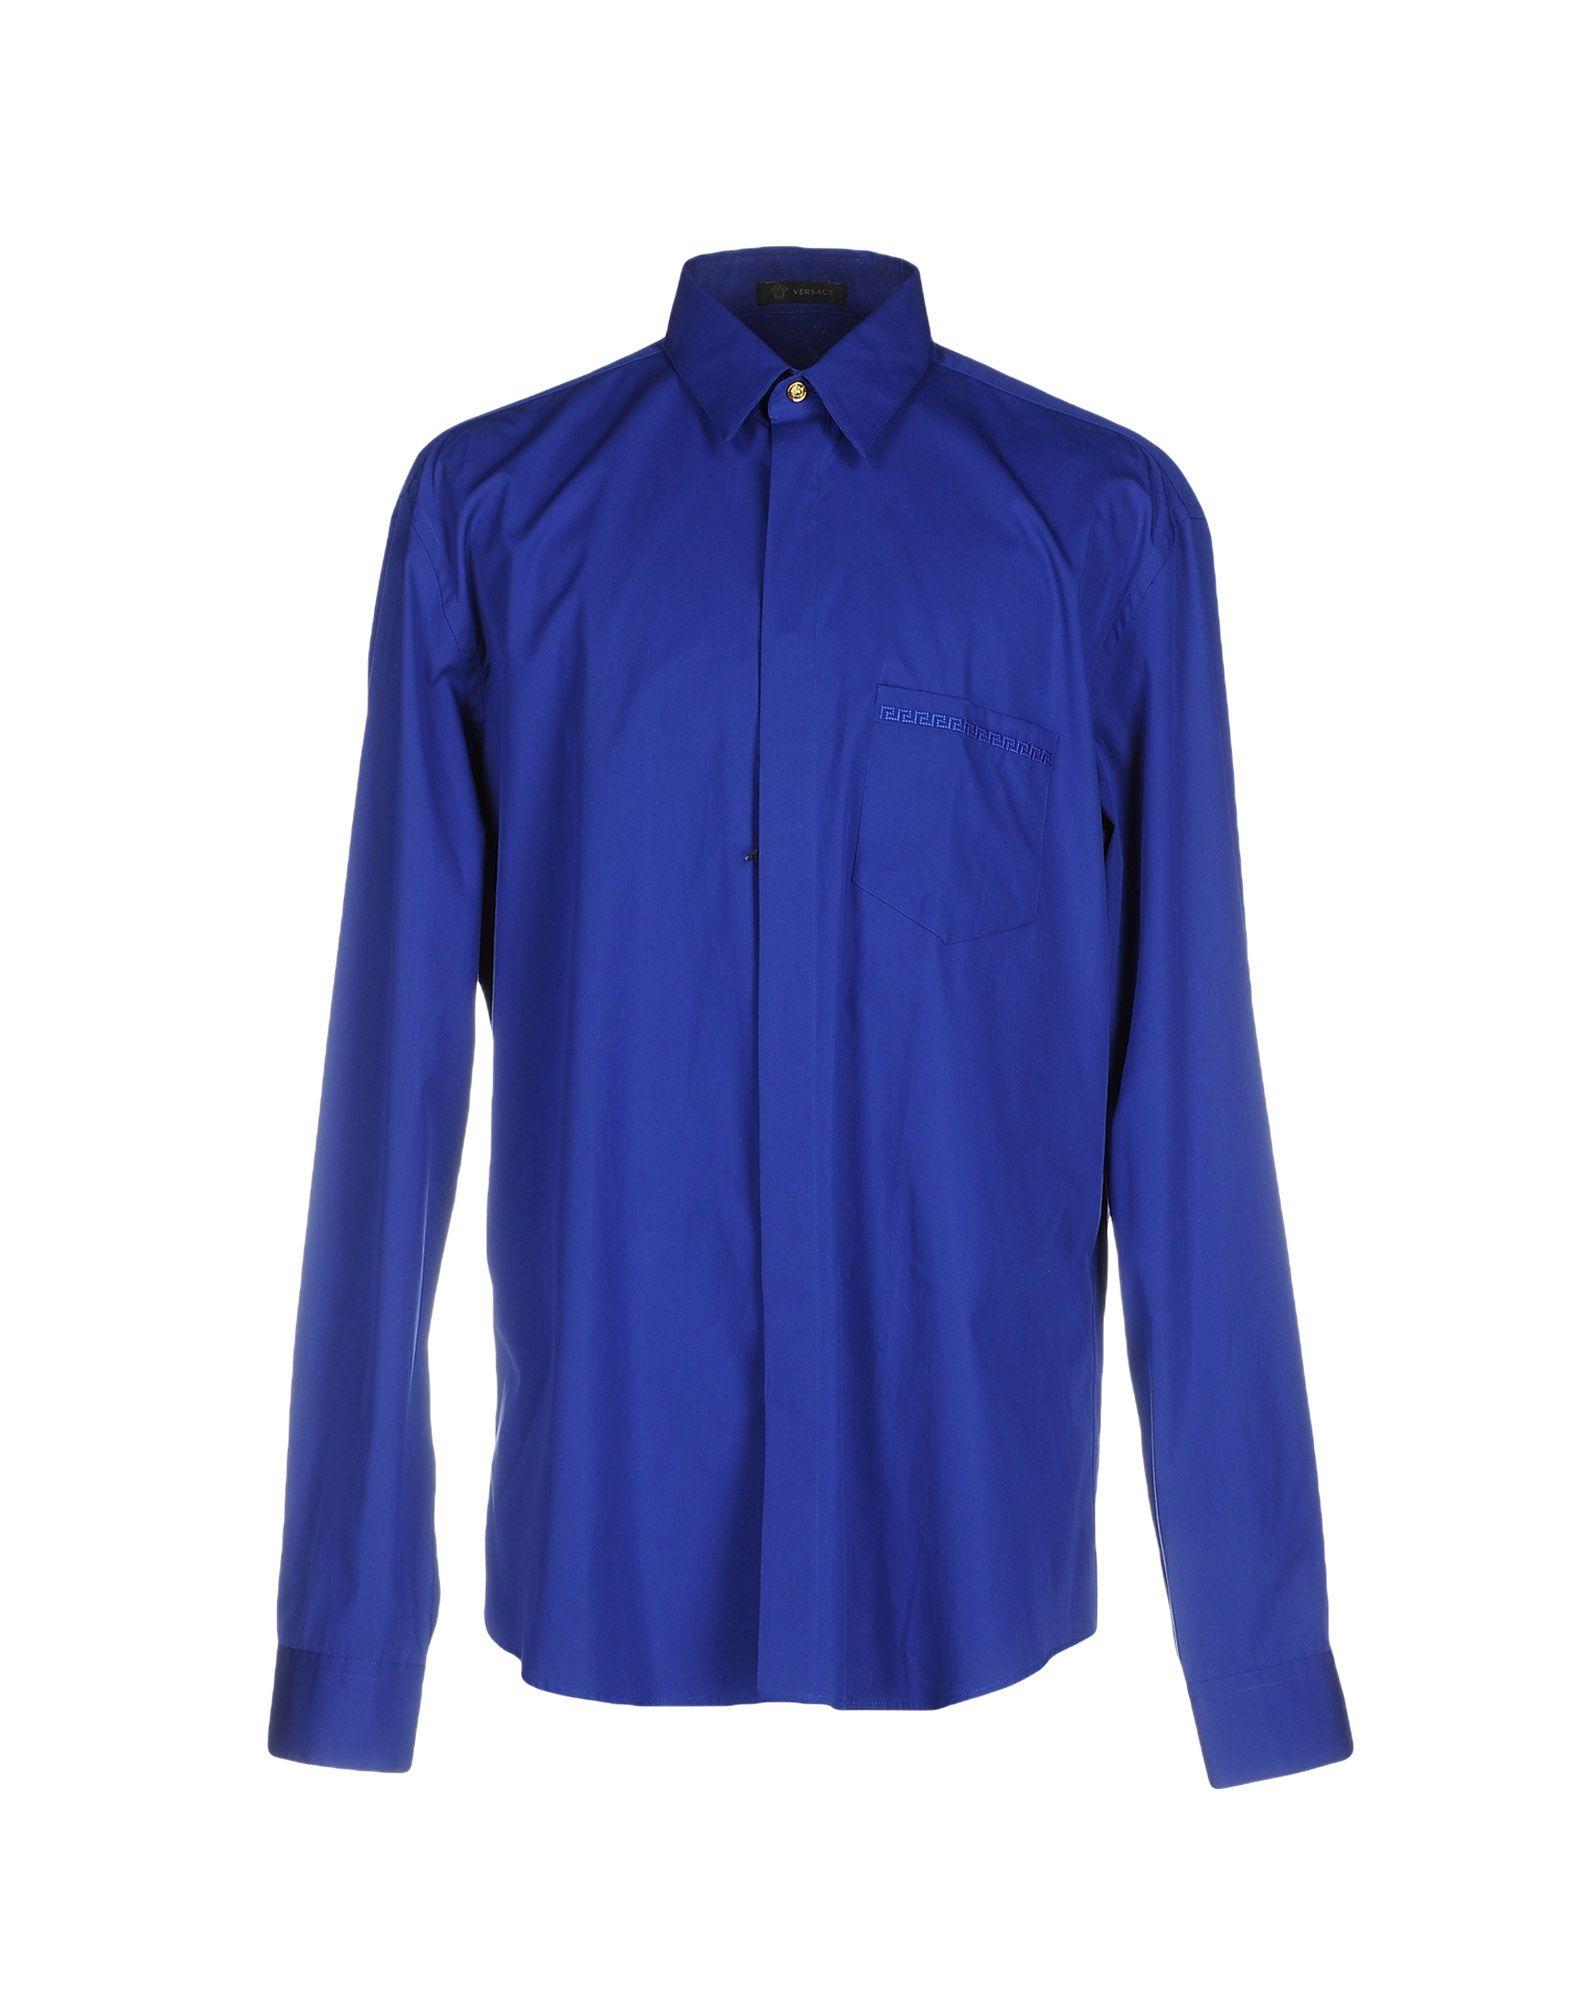 VERSACE Herren Hemd Farbe Königsblau Größe 3